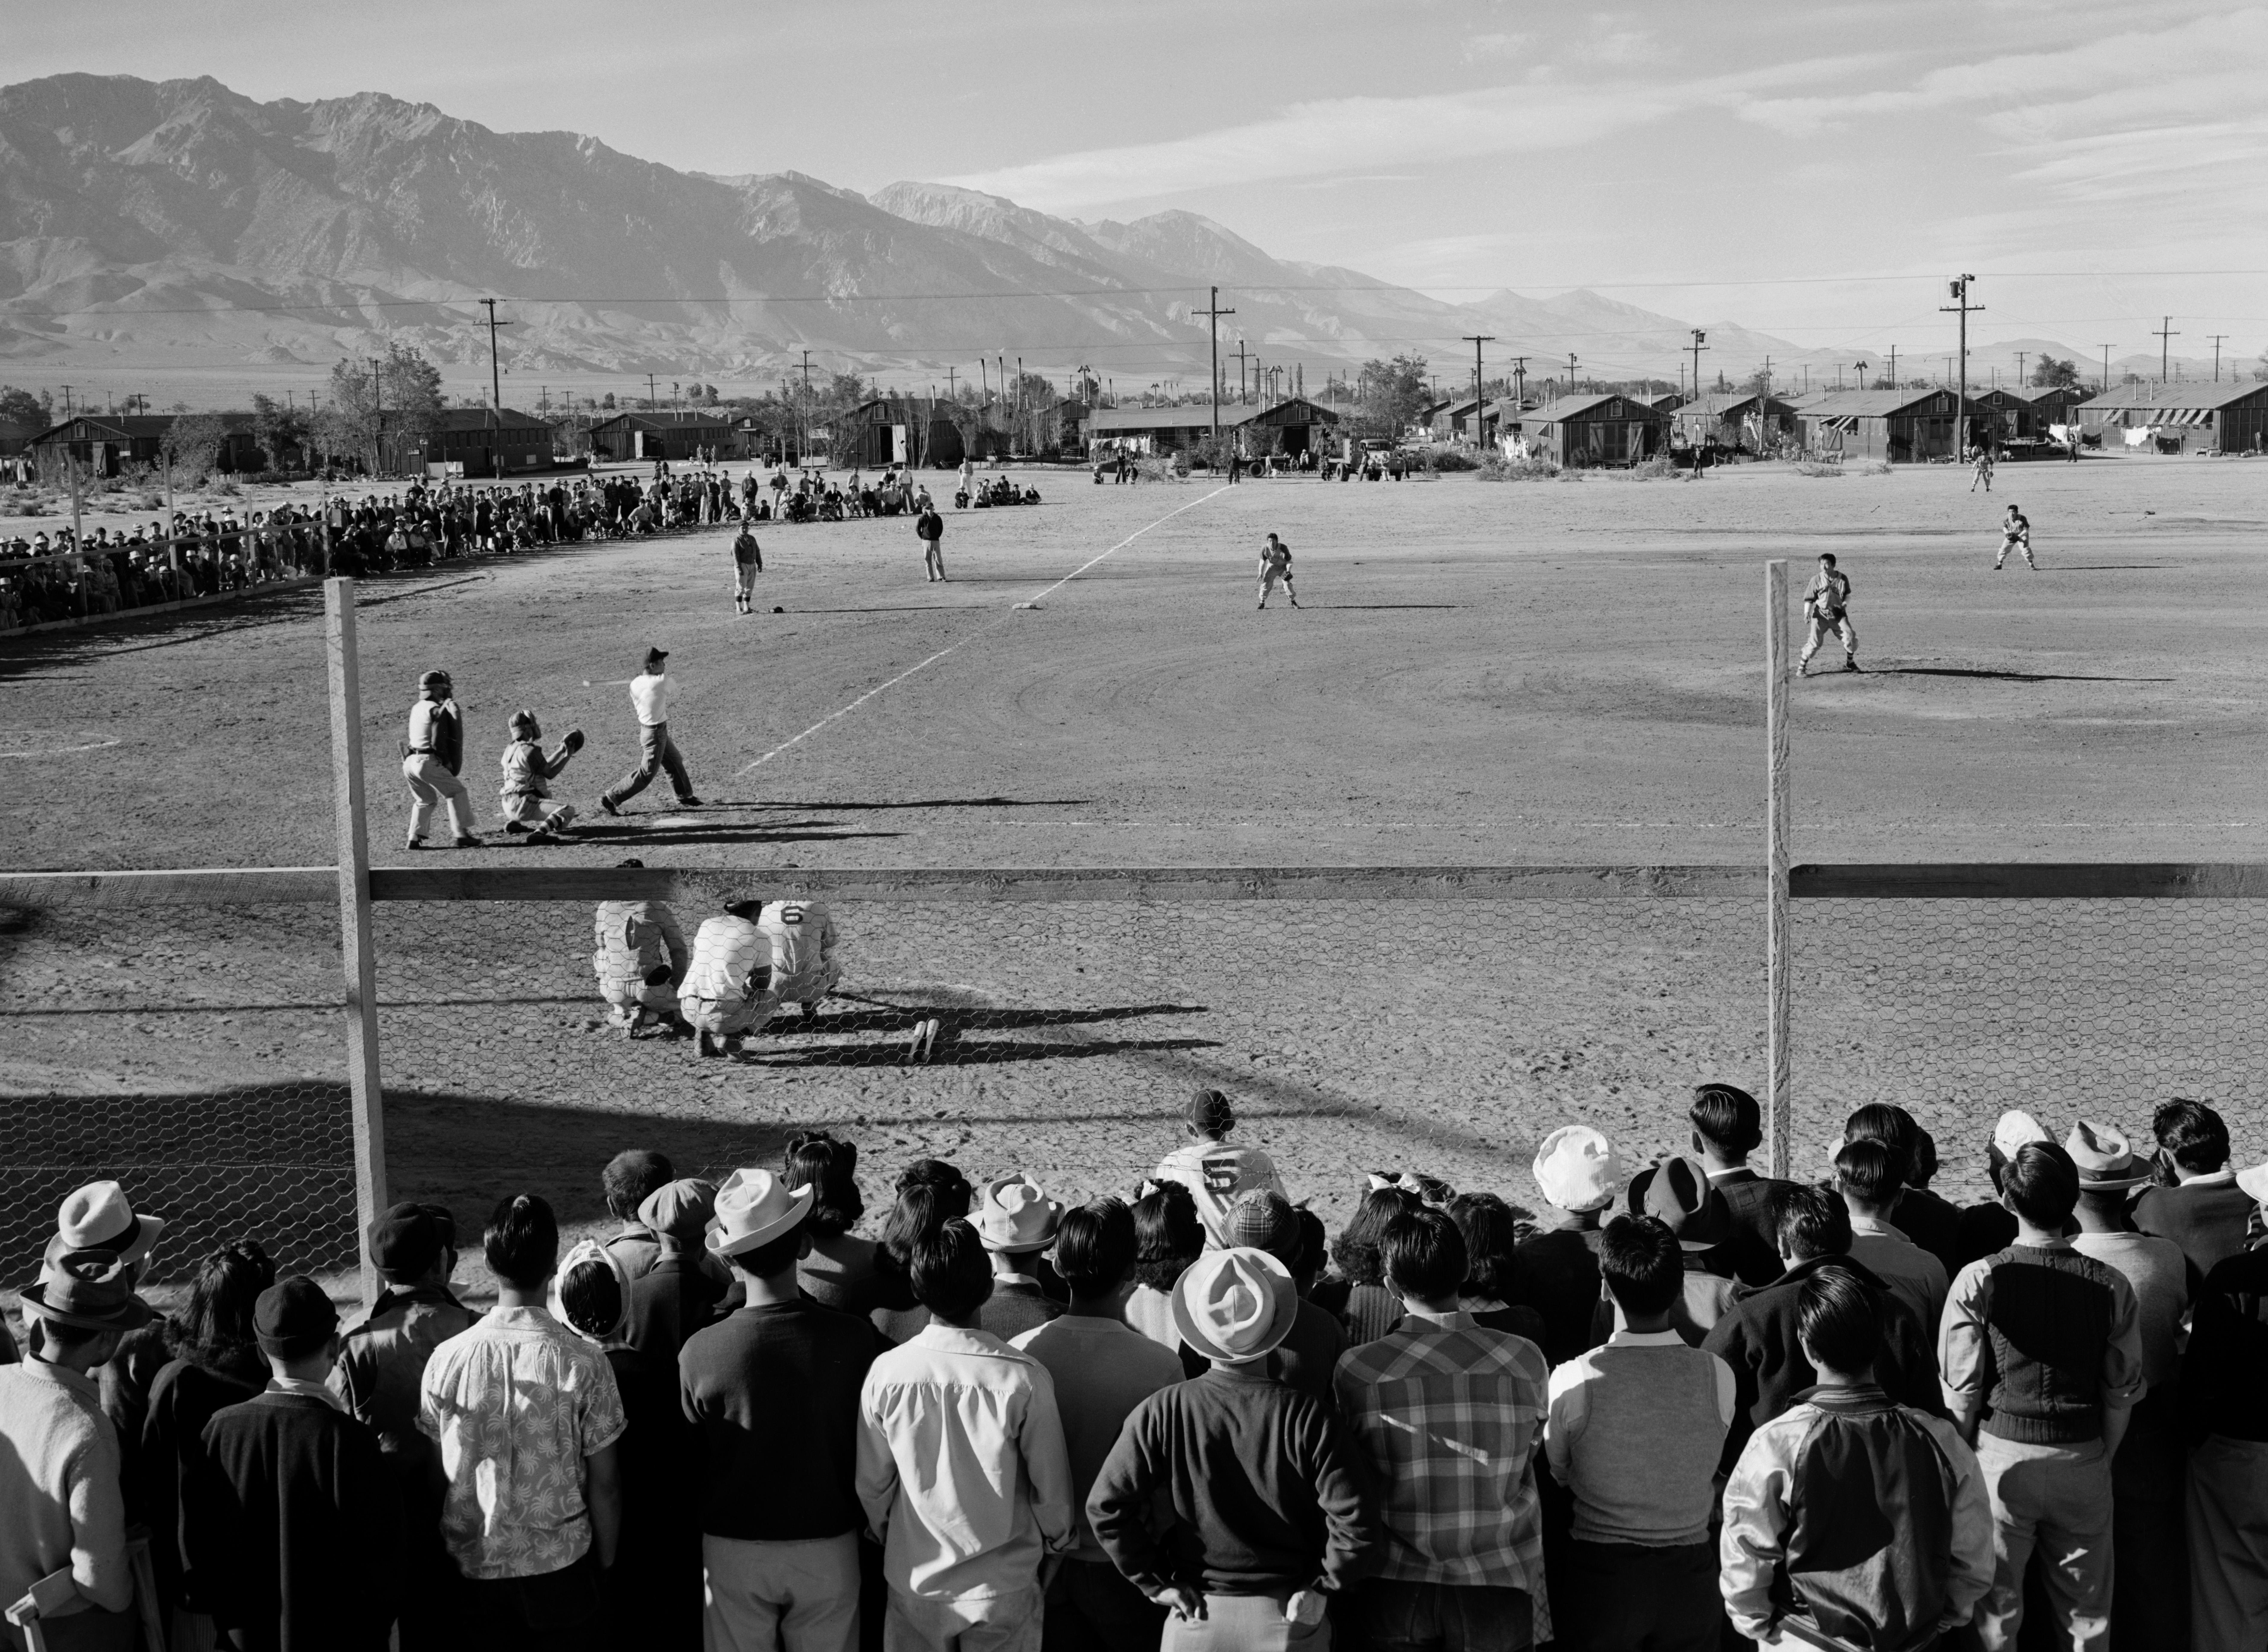 Baseball game, Manzanar War Relocation Center, 1943, Ansel Adams